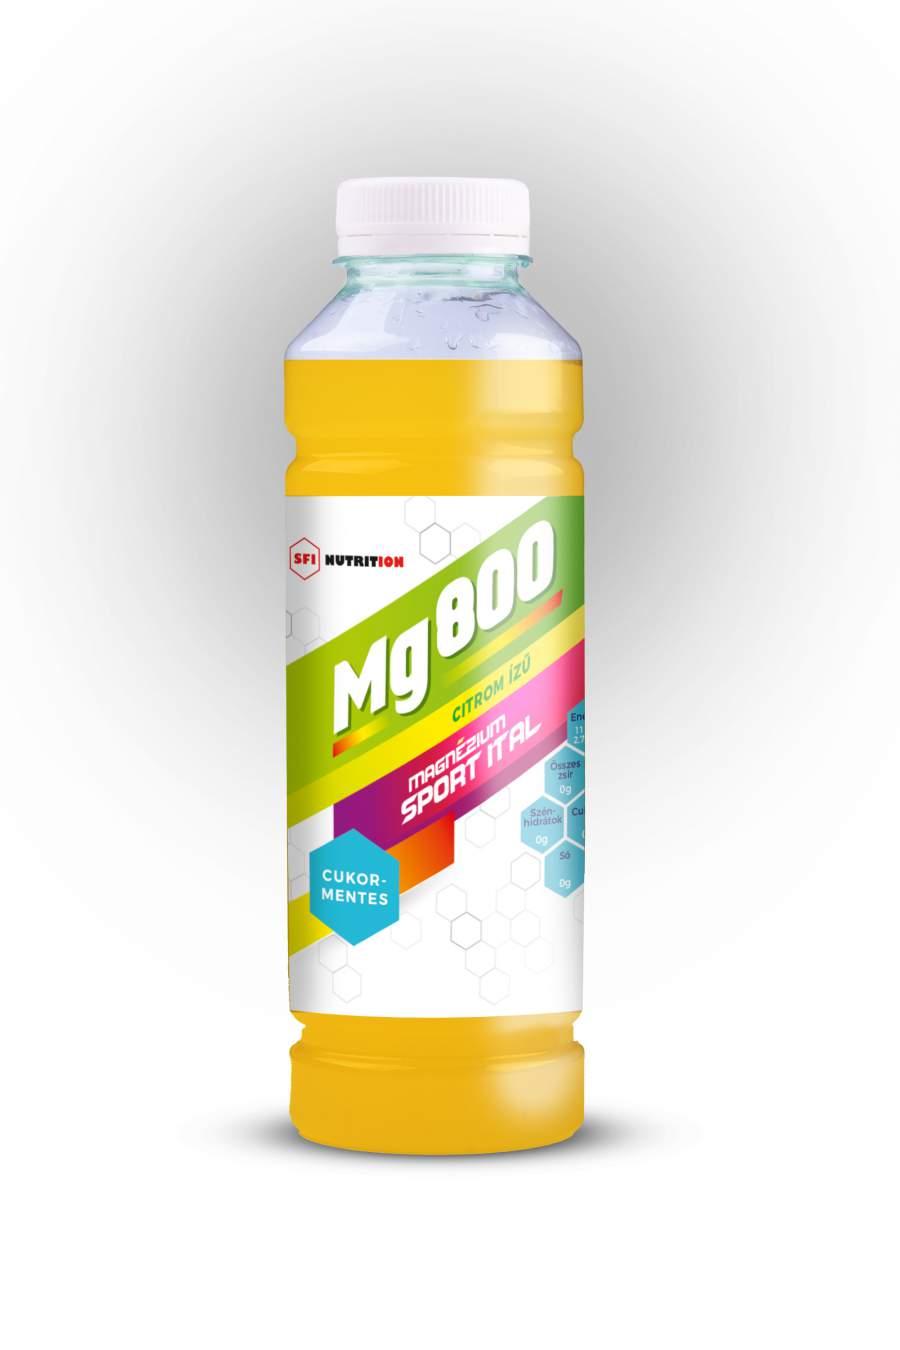 Cukormentes Mg 800 magnézium tartalmú sportital